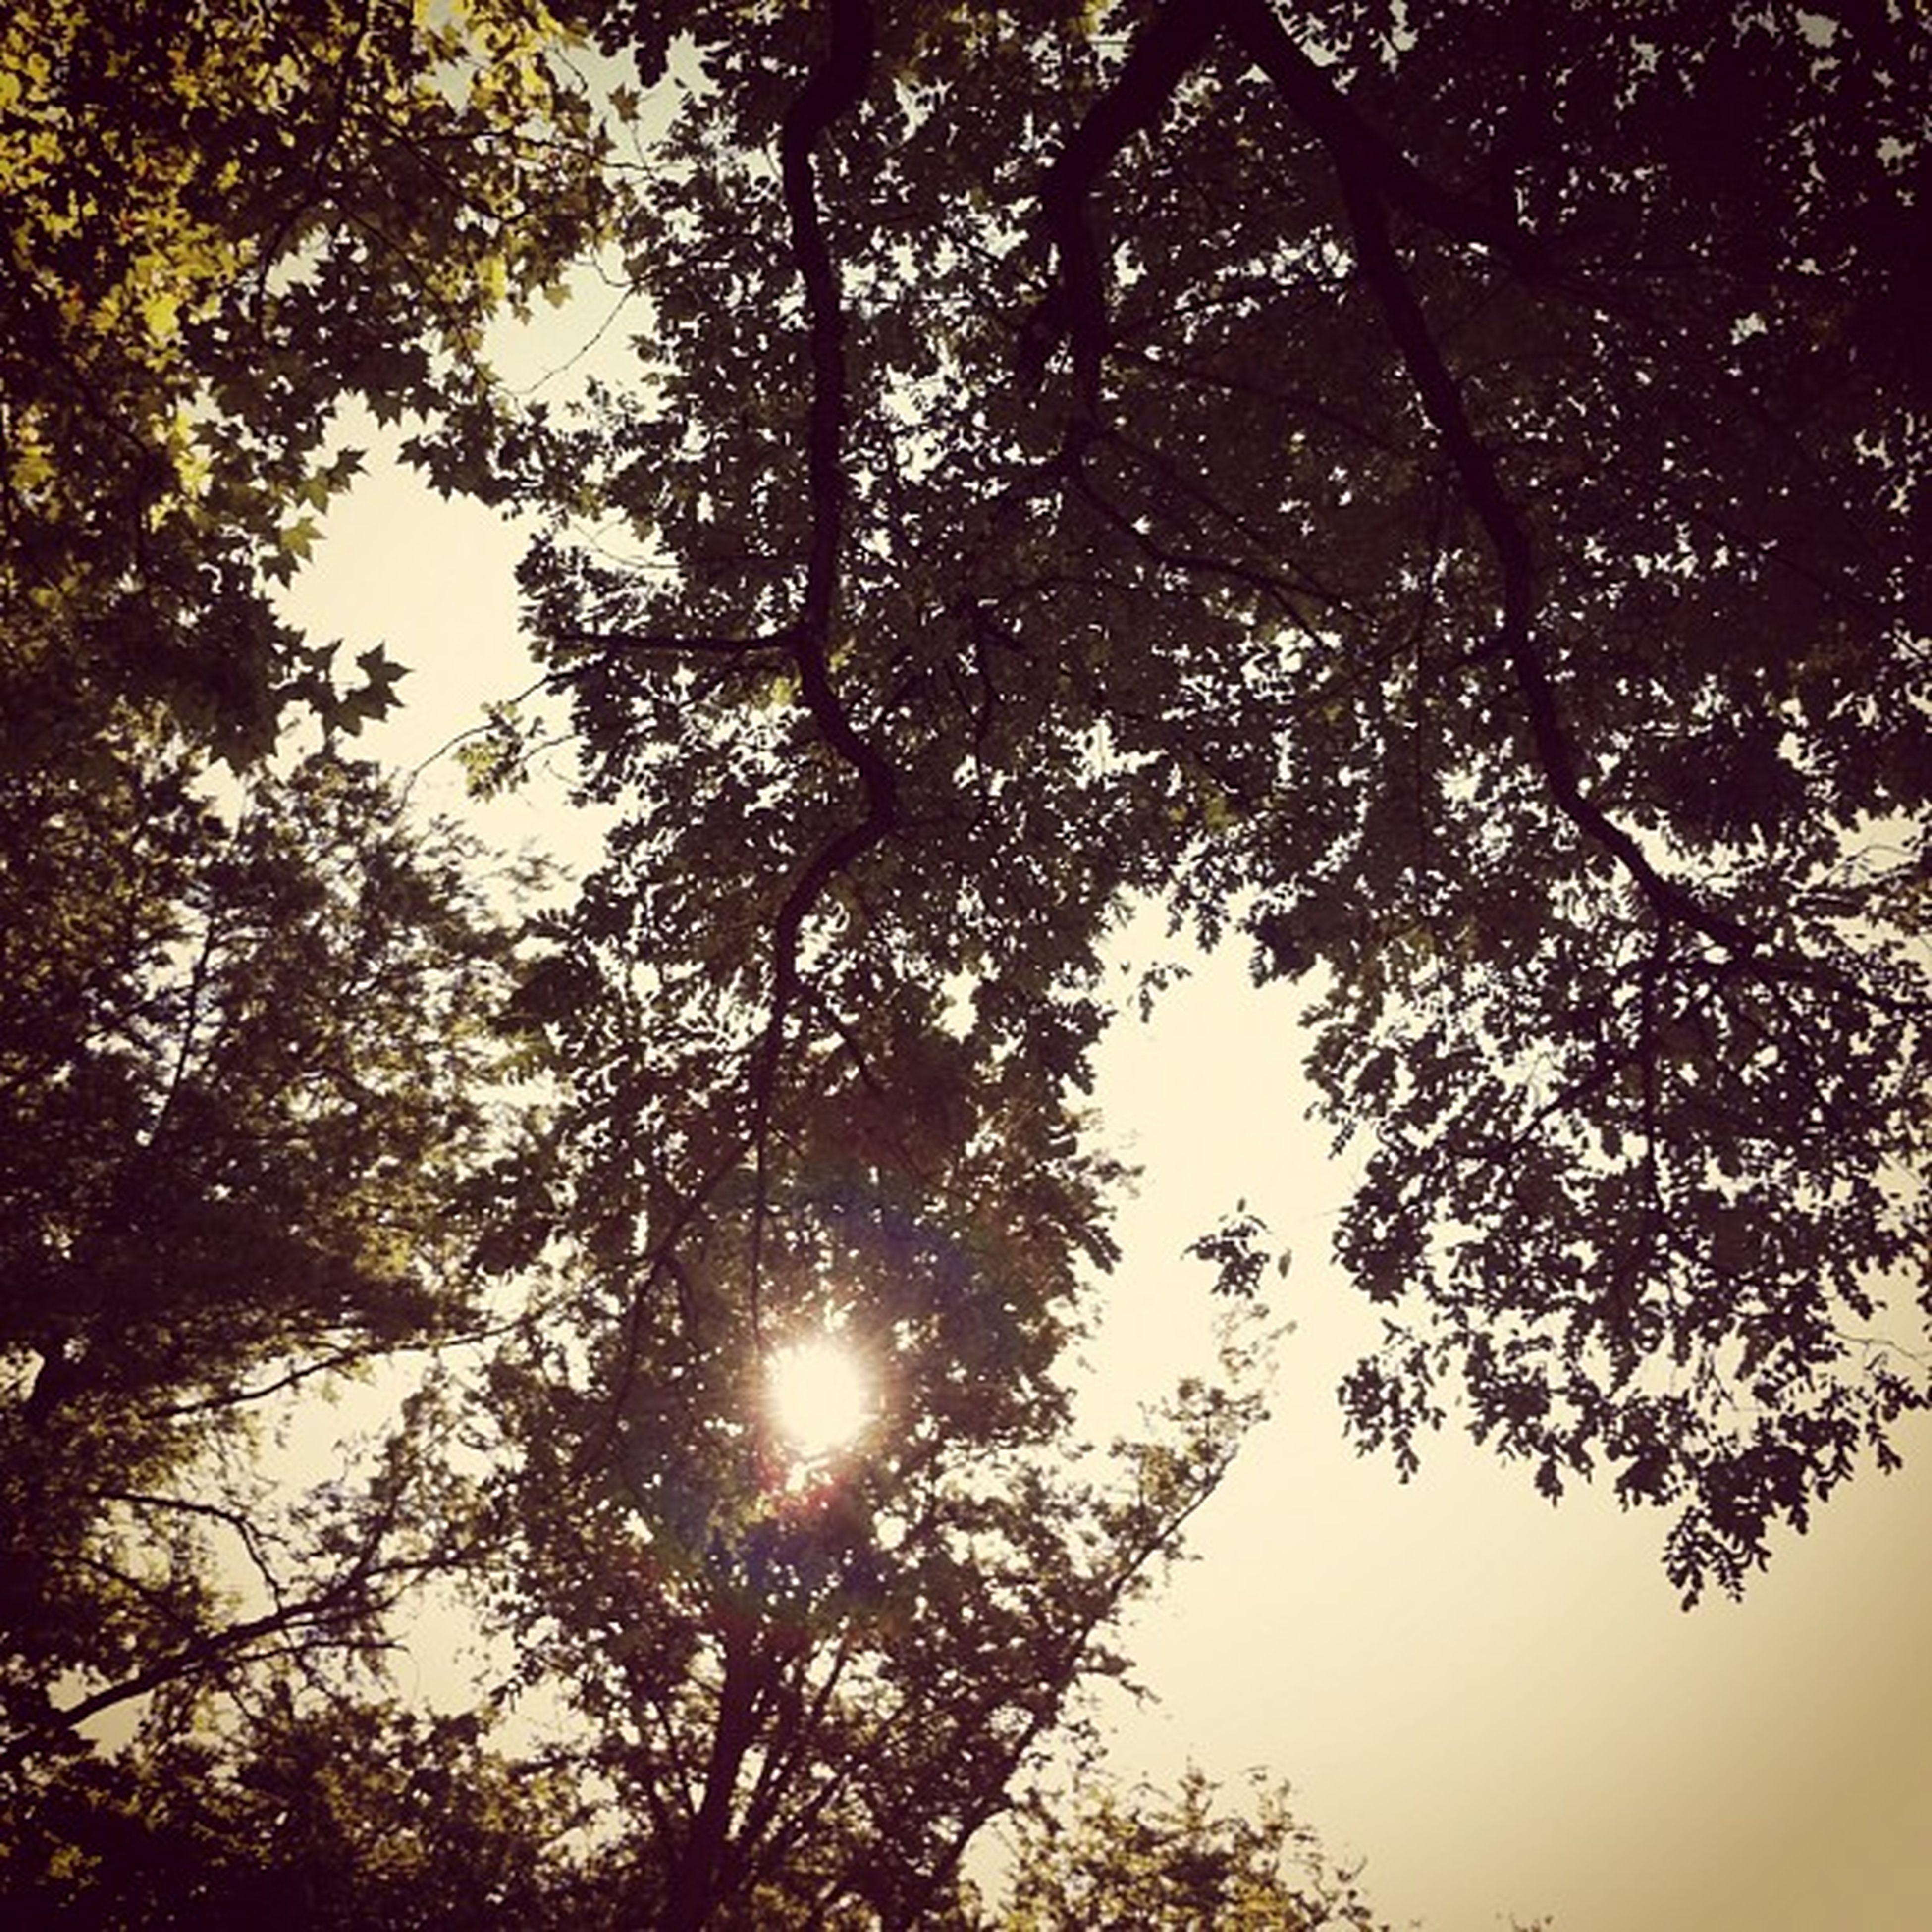 Looking up. #sky #sun #trees Sun Sky Trees